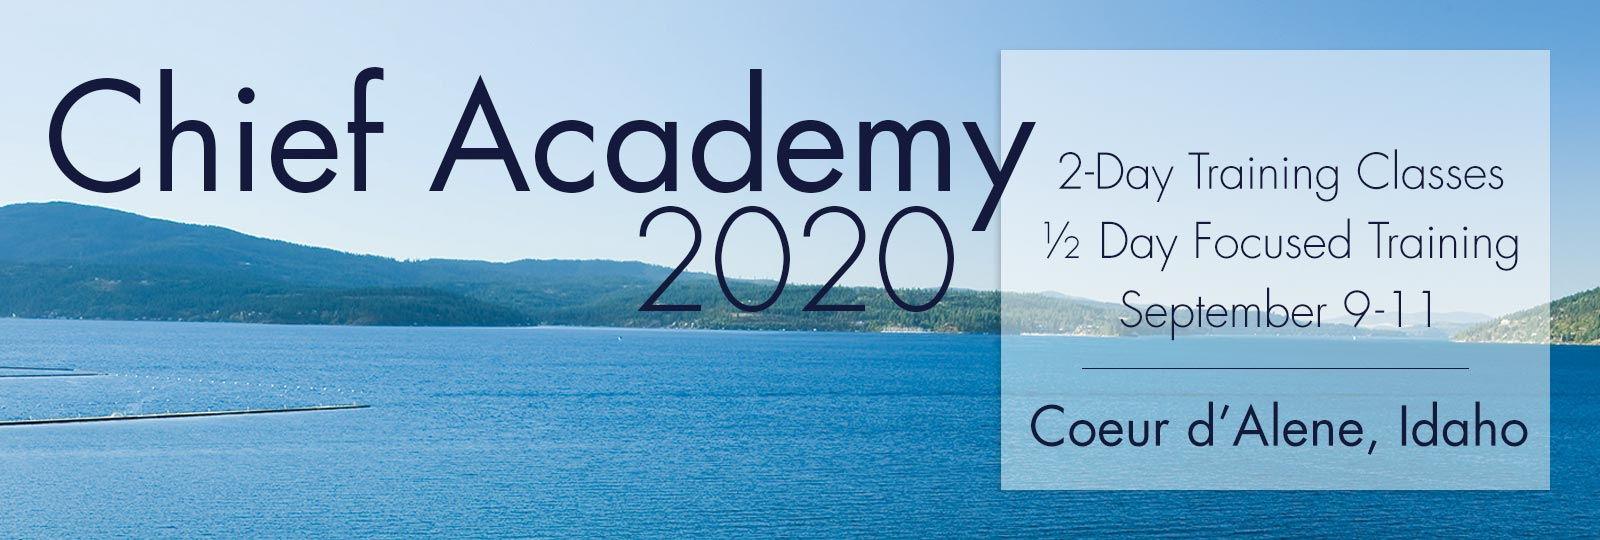 Chief Academy 2020 | 2-Day Training Classes | Half-day Focused Training | September 9-11 | Coeur d'Alene, Idaho